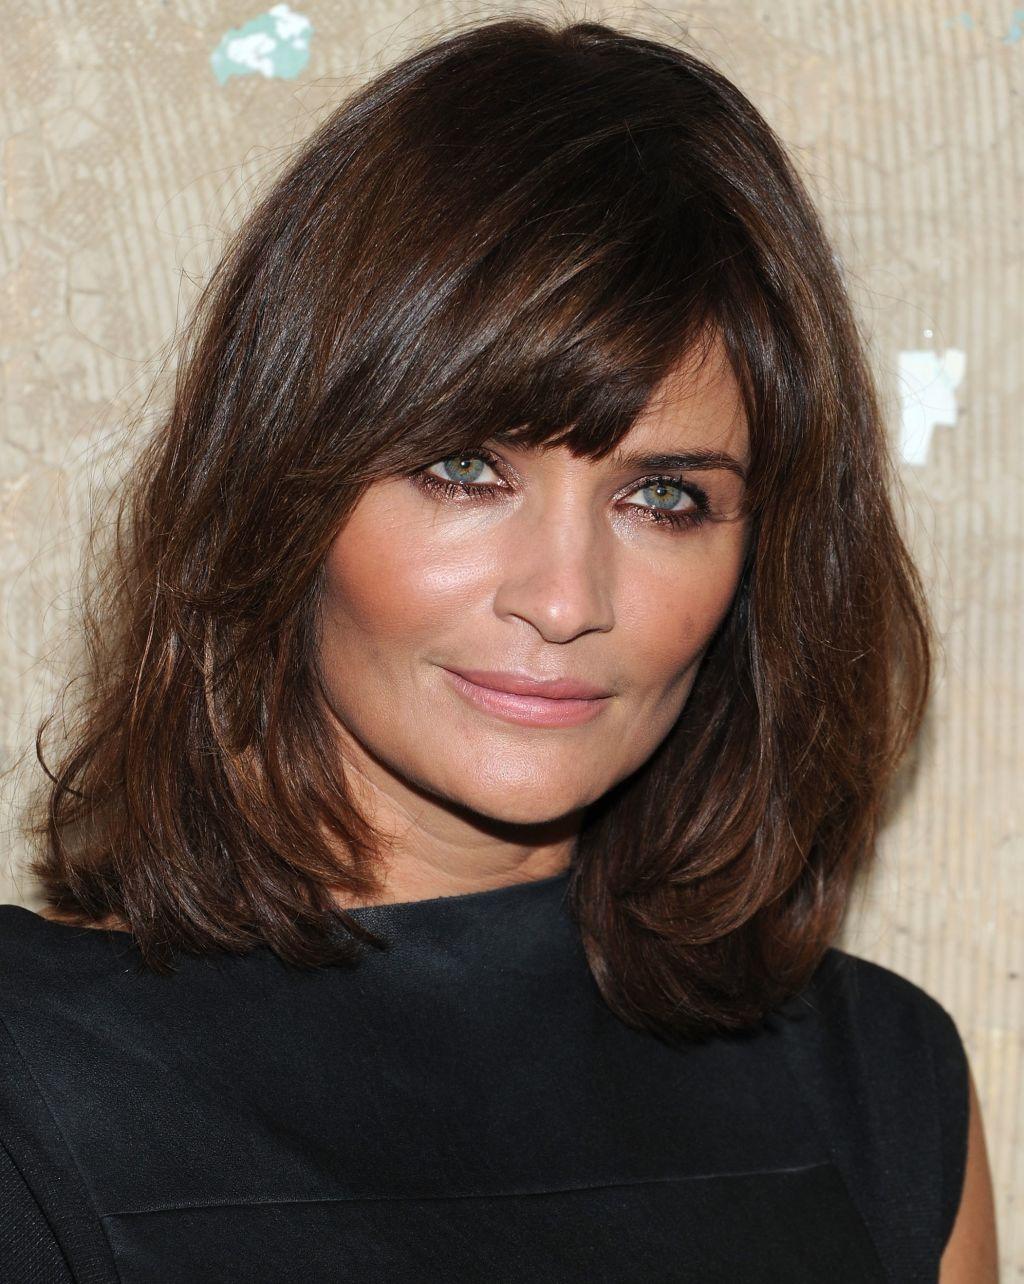 Shoulder length hairstyles Medium length with face framing bangs